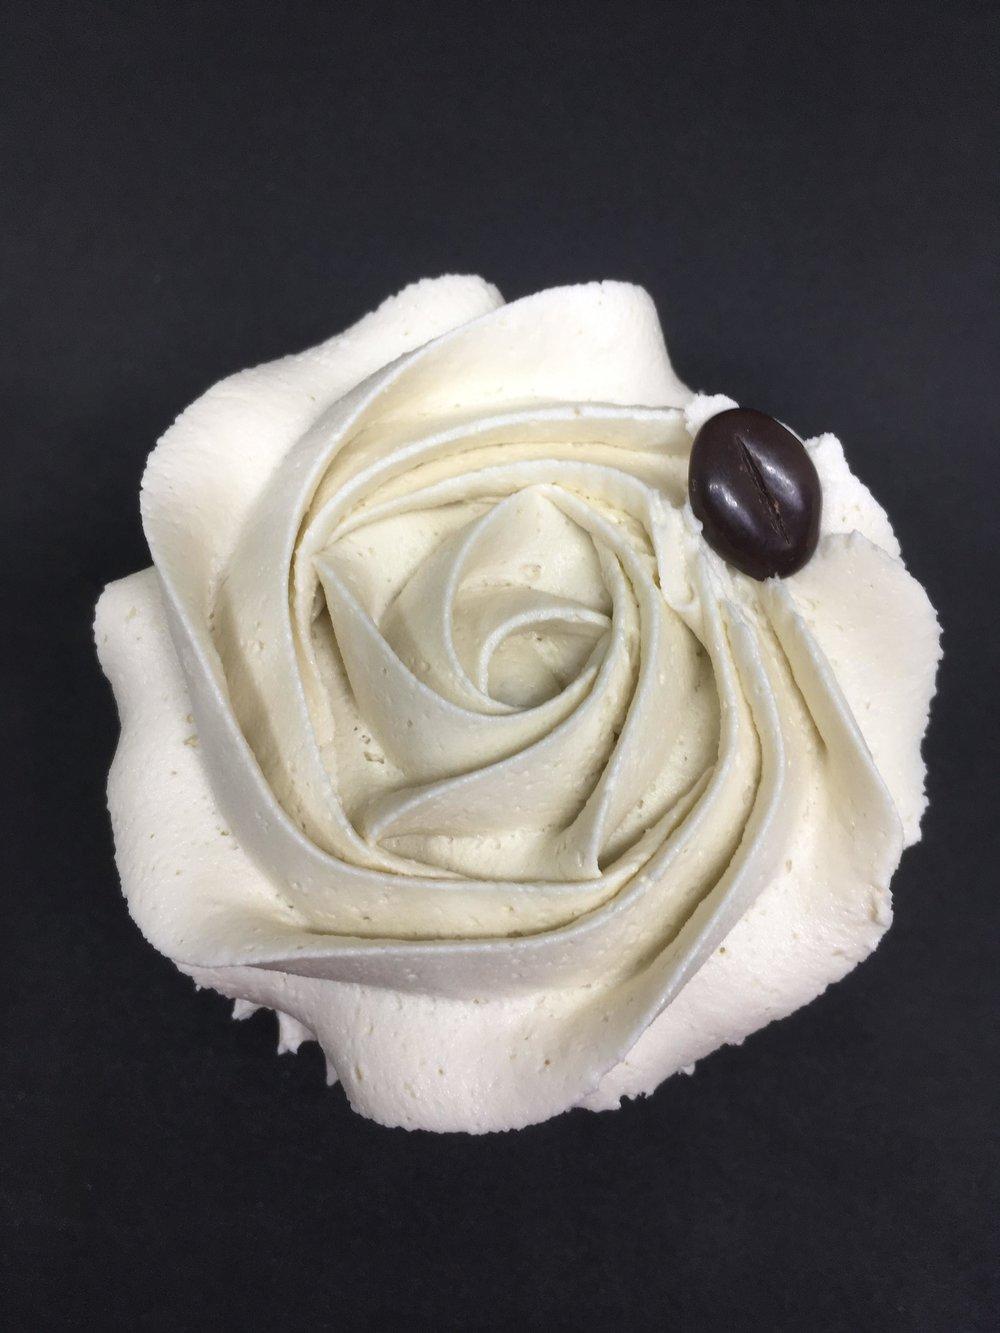 Vanilla Latte - A vanilla cupcake with a sweet latte flavoured buttercream. Optional caramel sauce filling